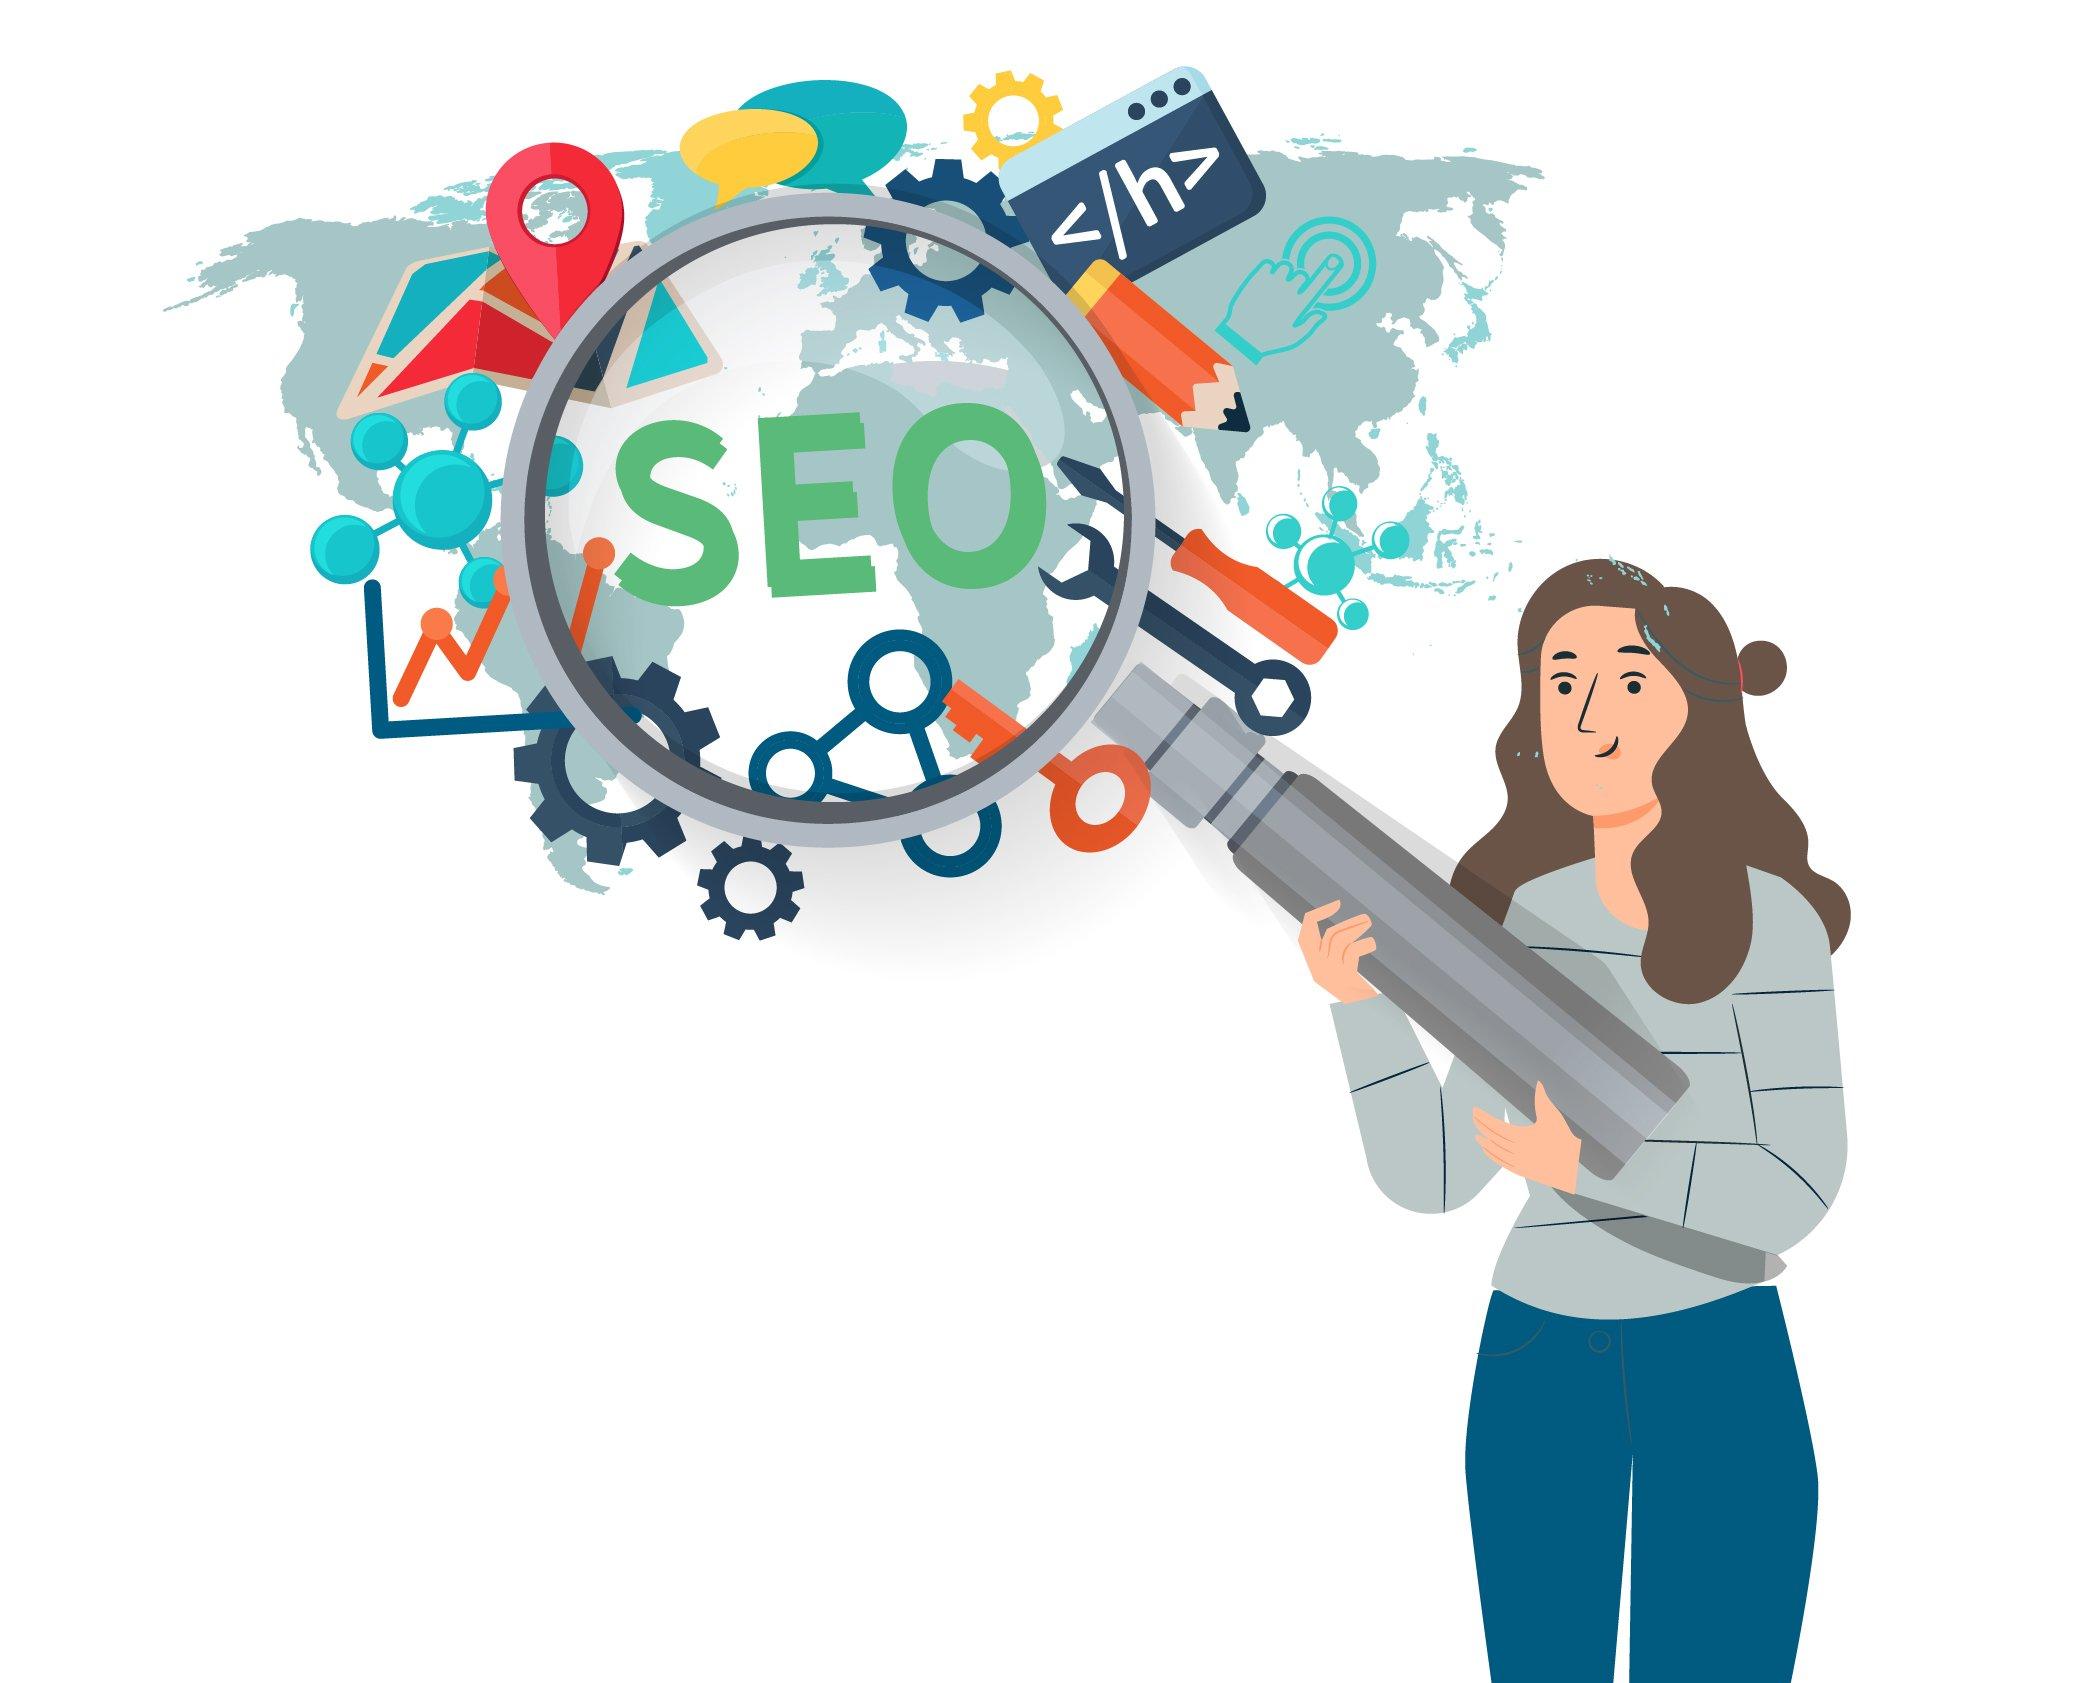 Aplusdigitalsolutions - Digital Marketing Company | SEO Company